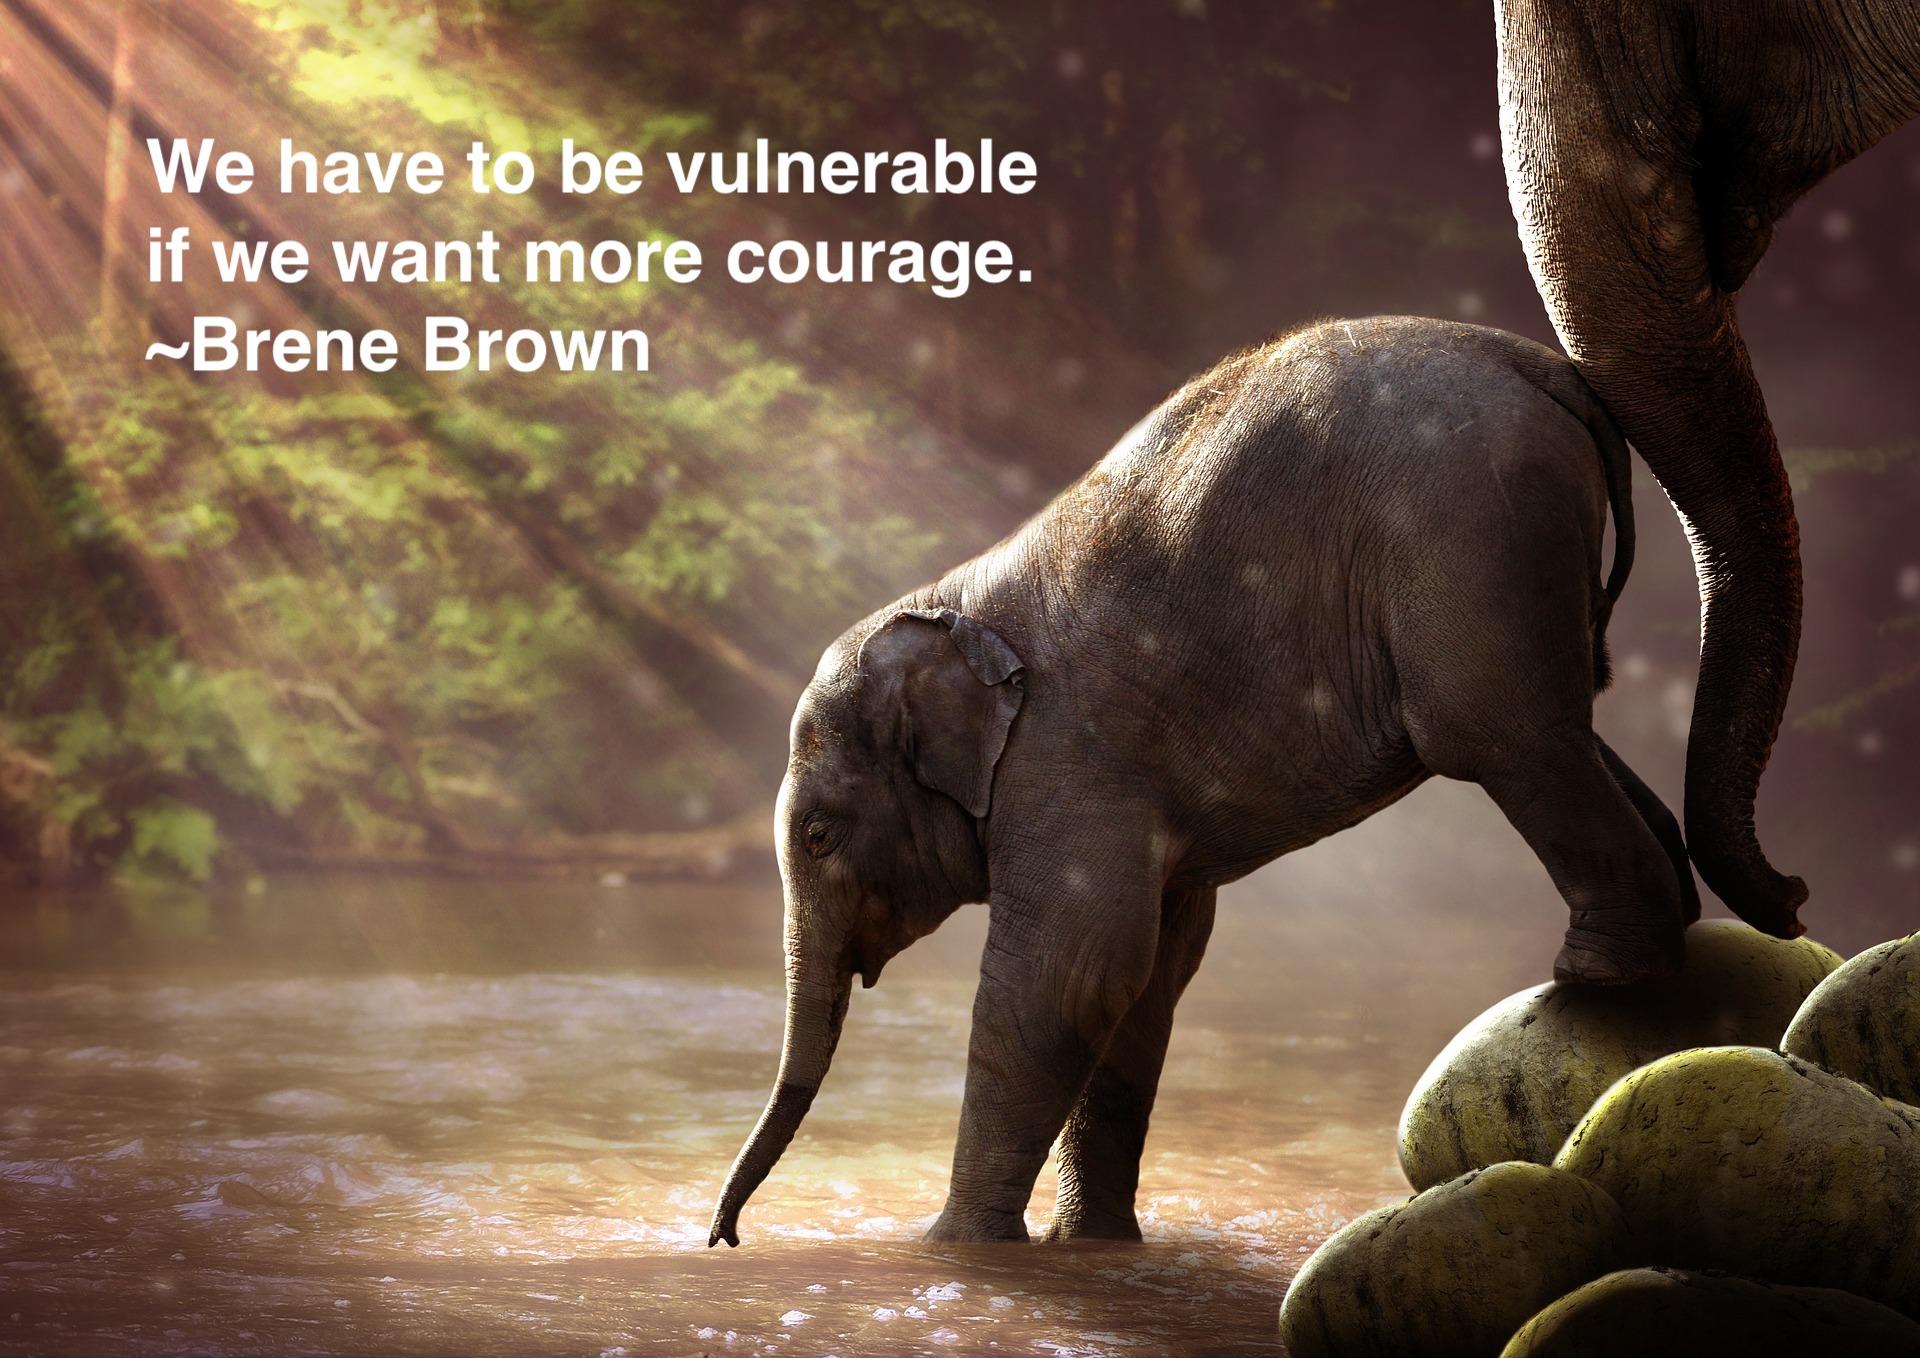 elephant-2380009_1920_vulnerable quote.jpg